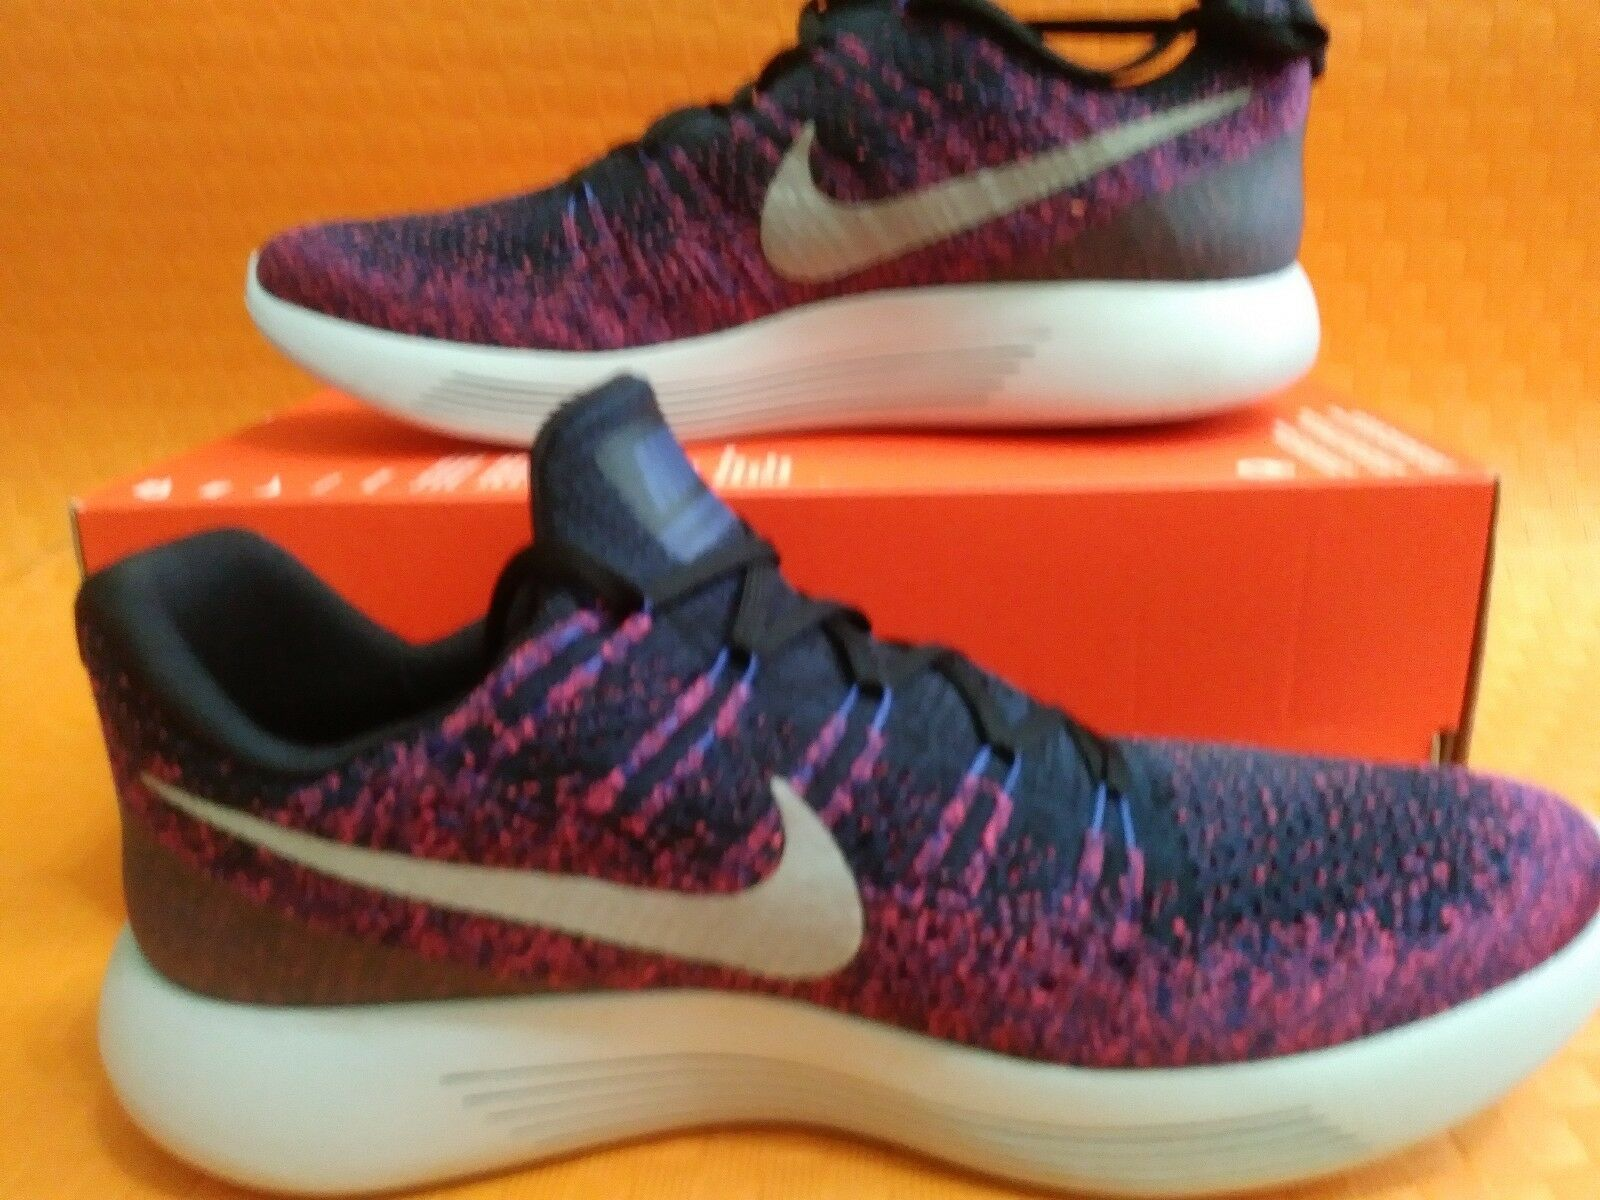 New Brand Nike Lunarepic Low Flyknit2 (863779 015) Black Reflect Silver Size11.5